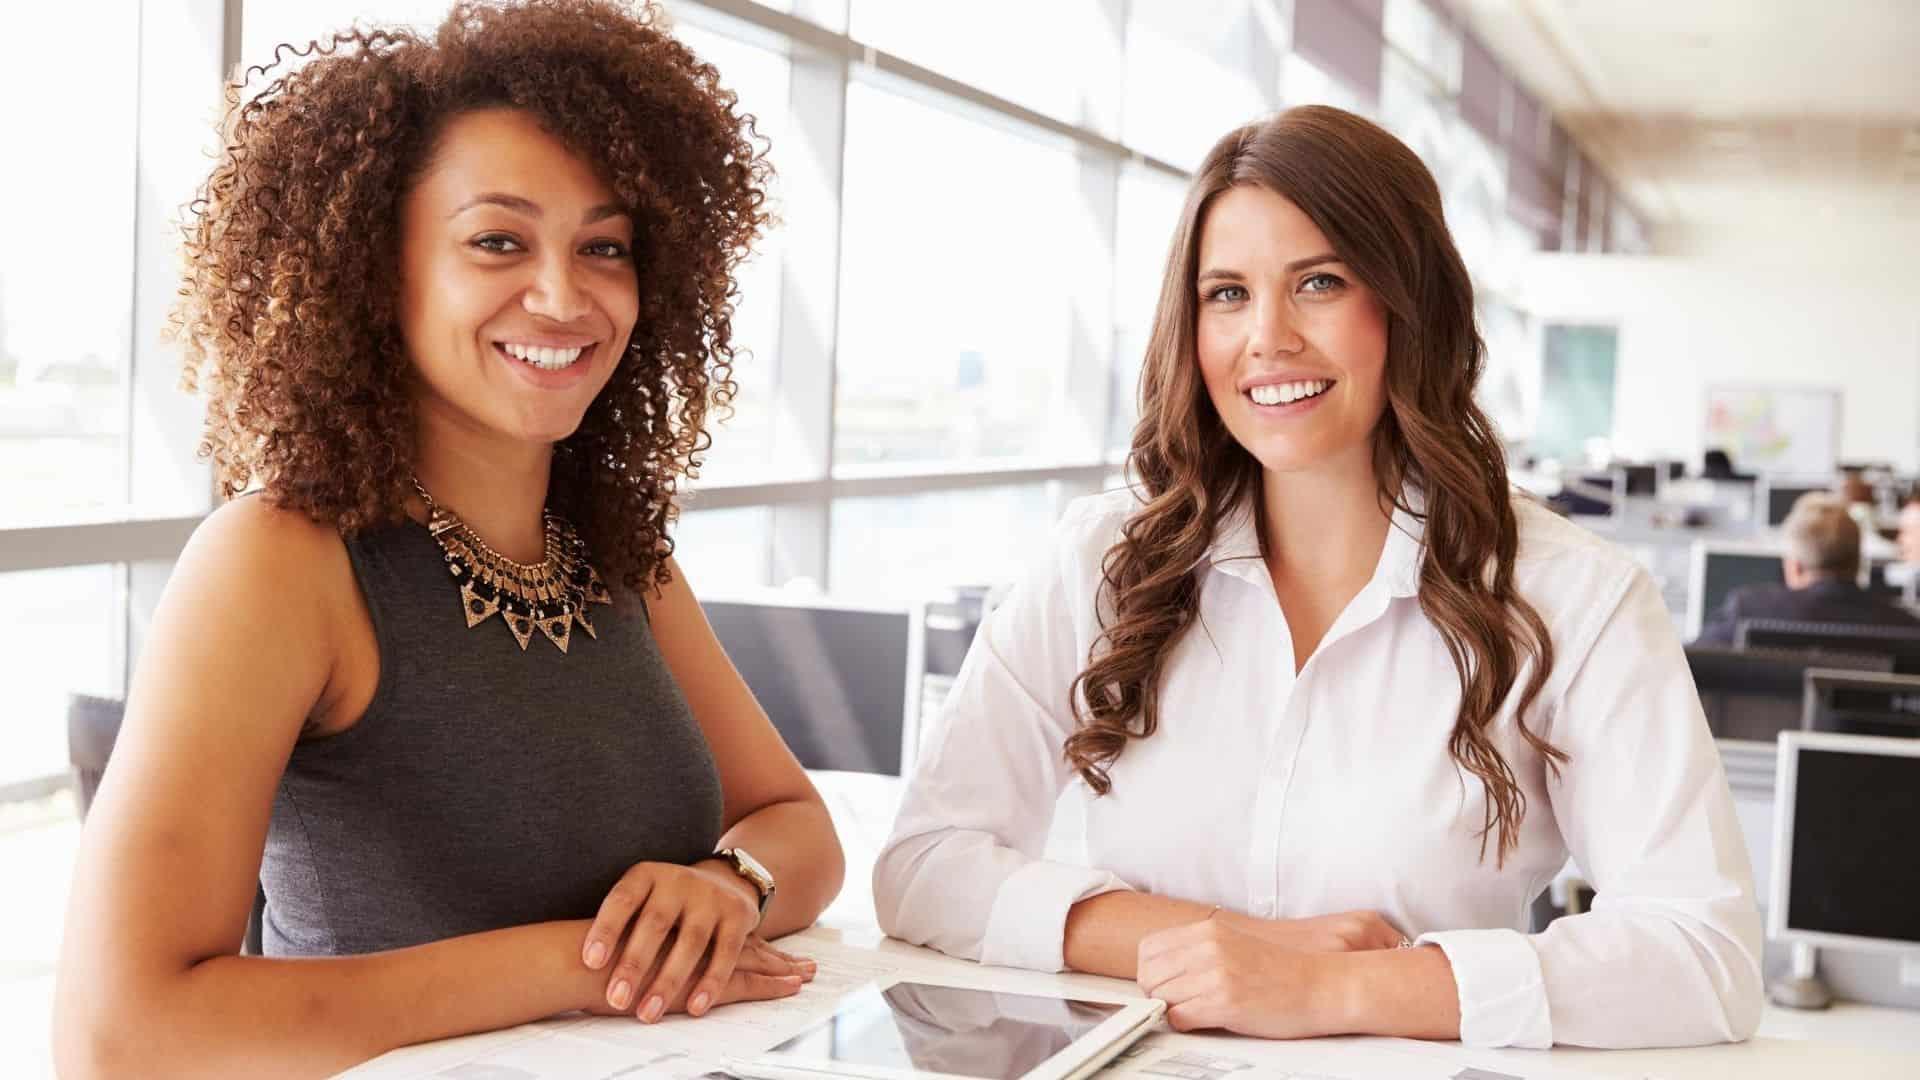 accountability buddy-two women working together